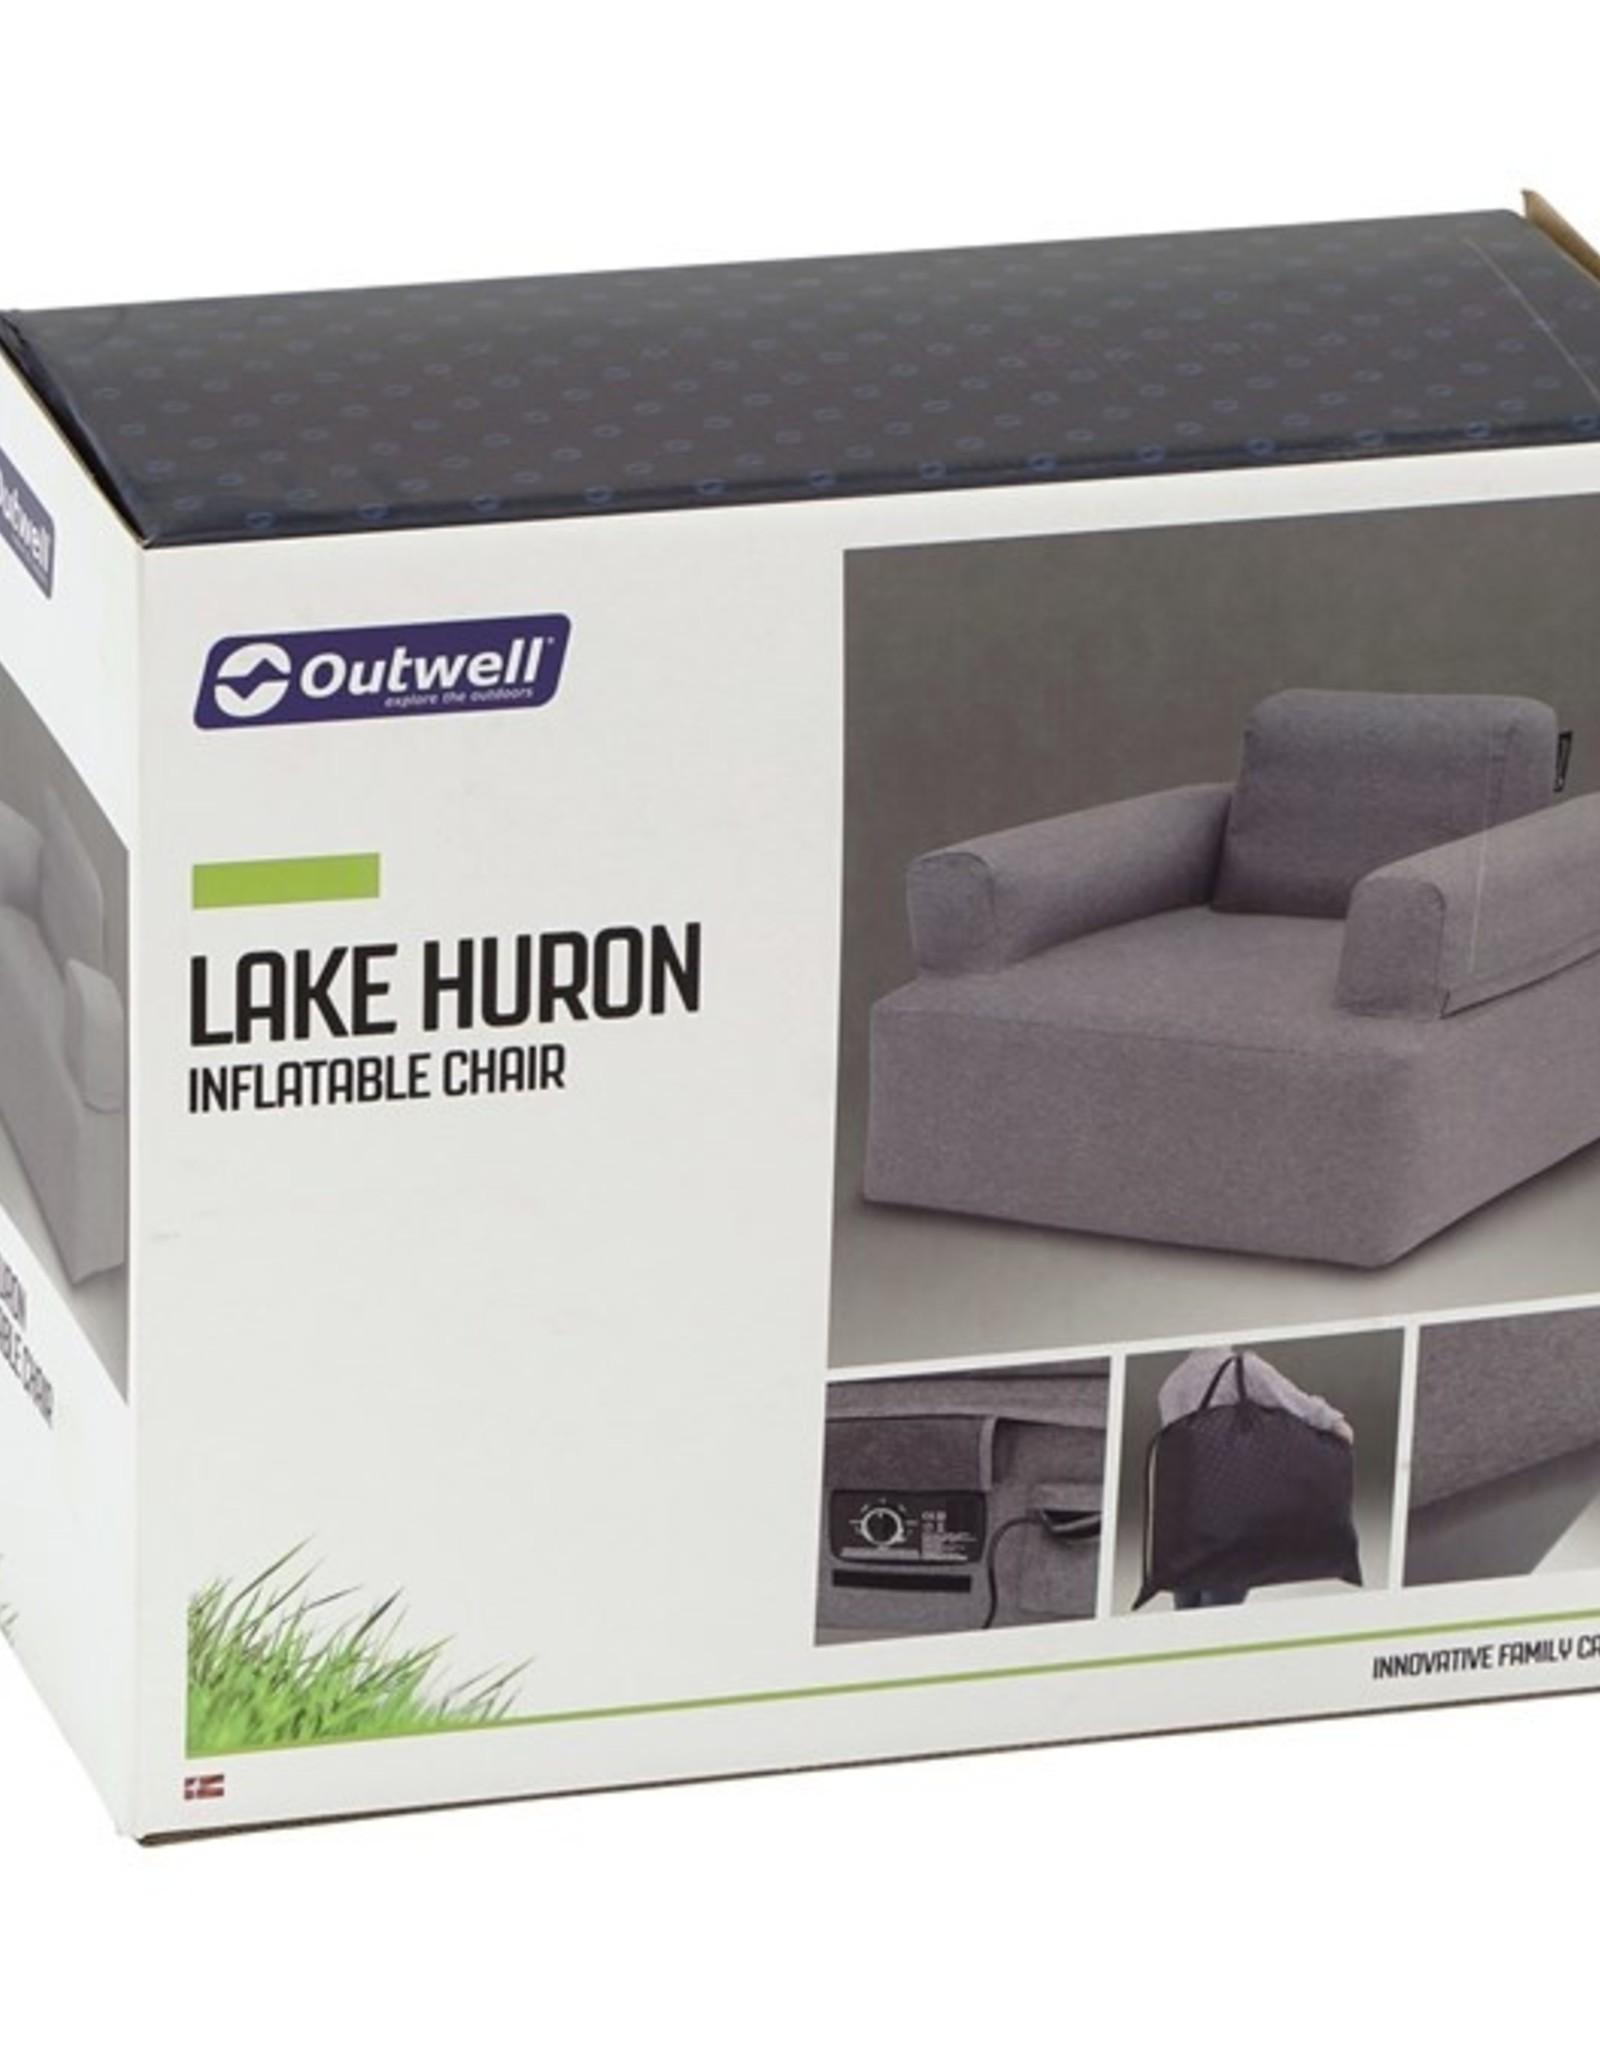 Outwell Lake Huron aufblasbarer Stuhl Outwell